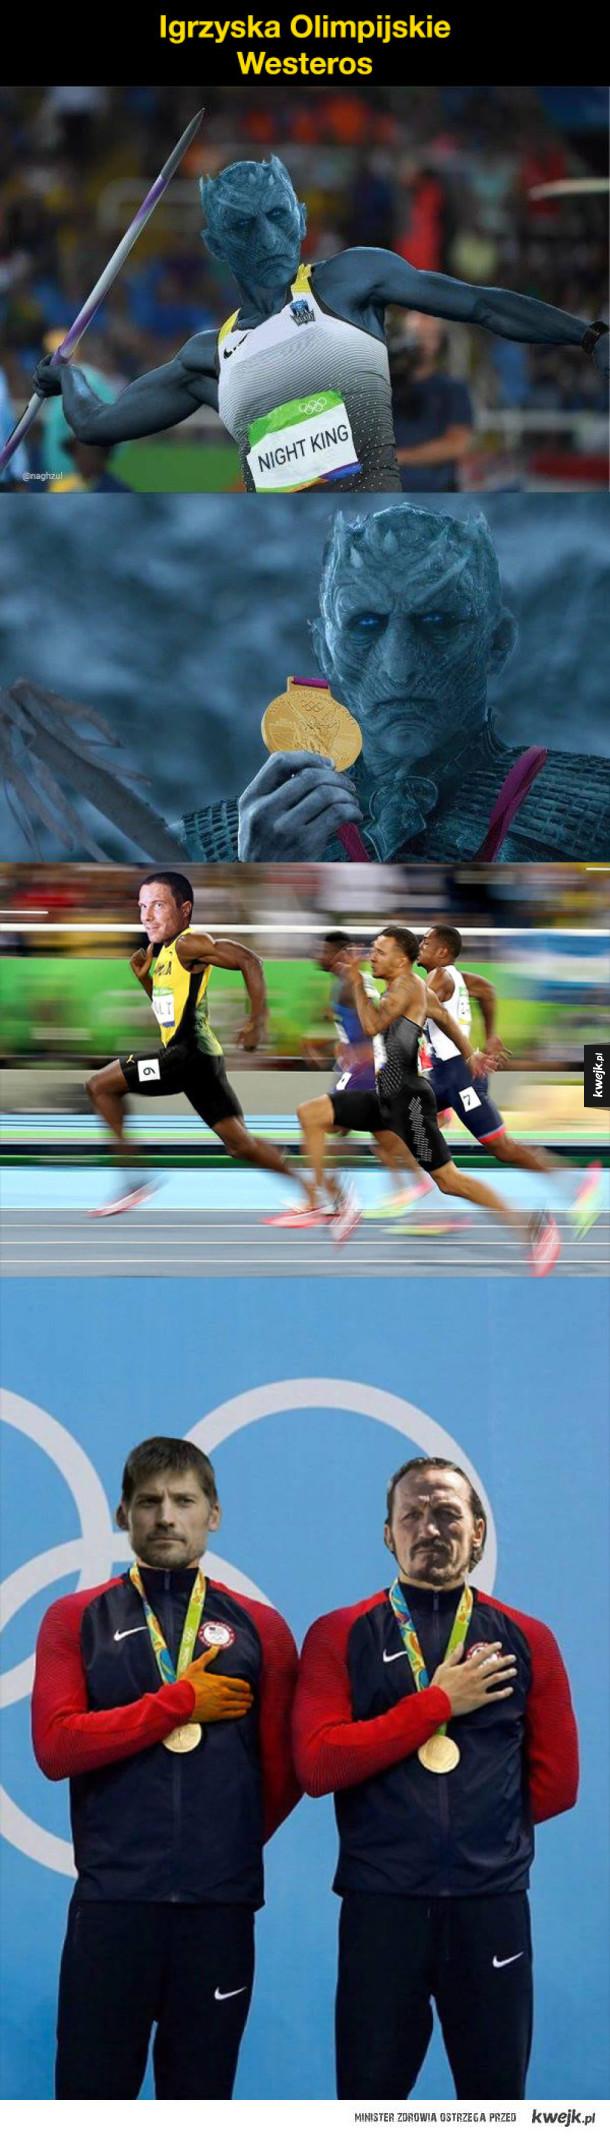 Olimpiada w Westeros